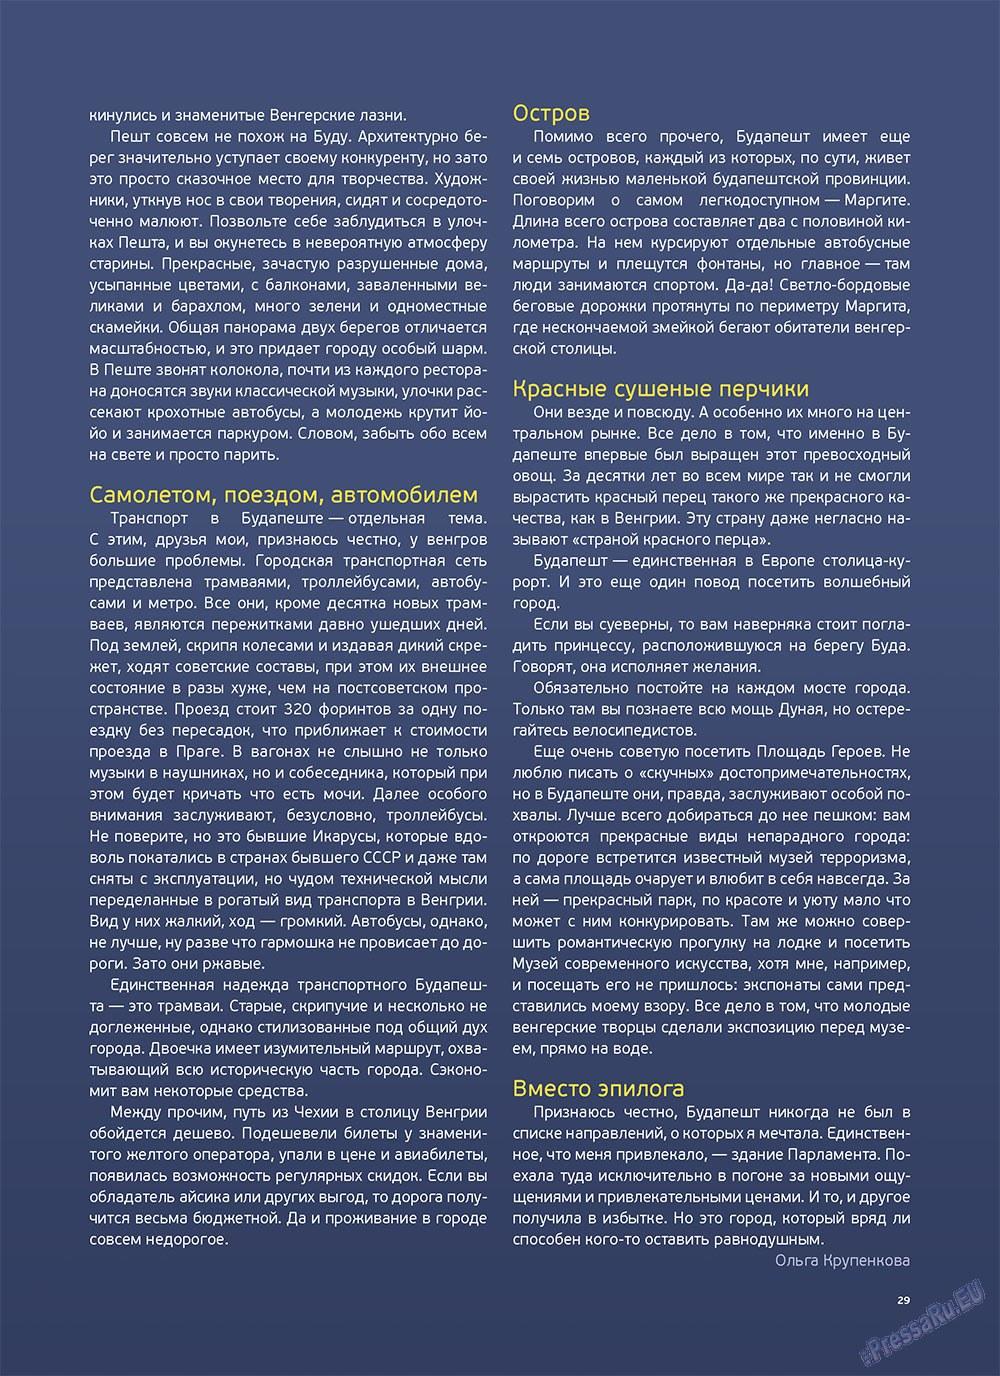 Артек (журнал). 2011 год, номер 4, стр. 31